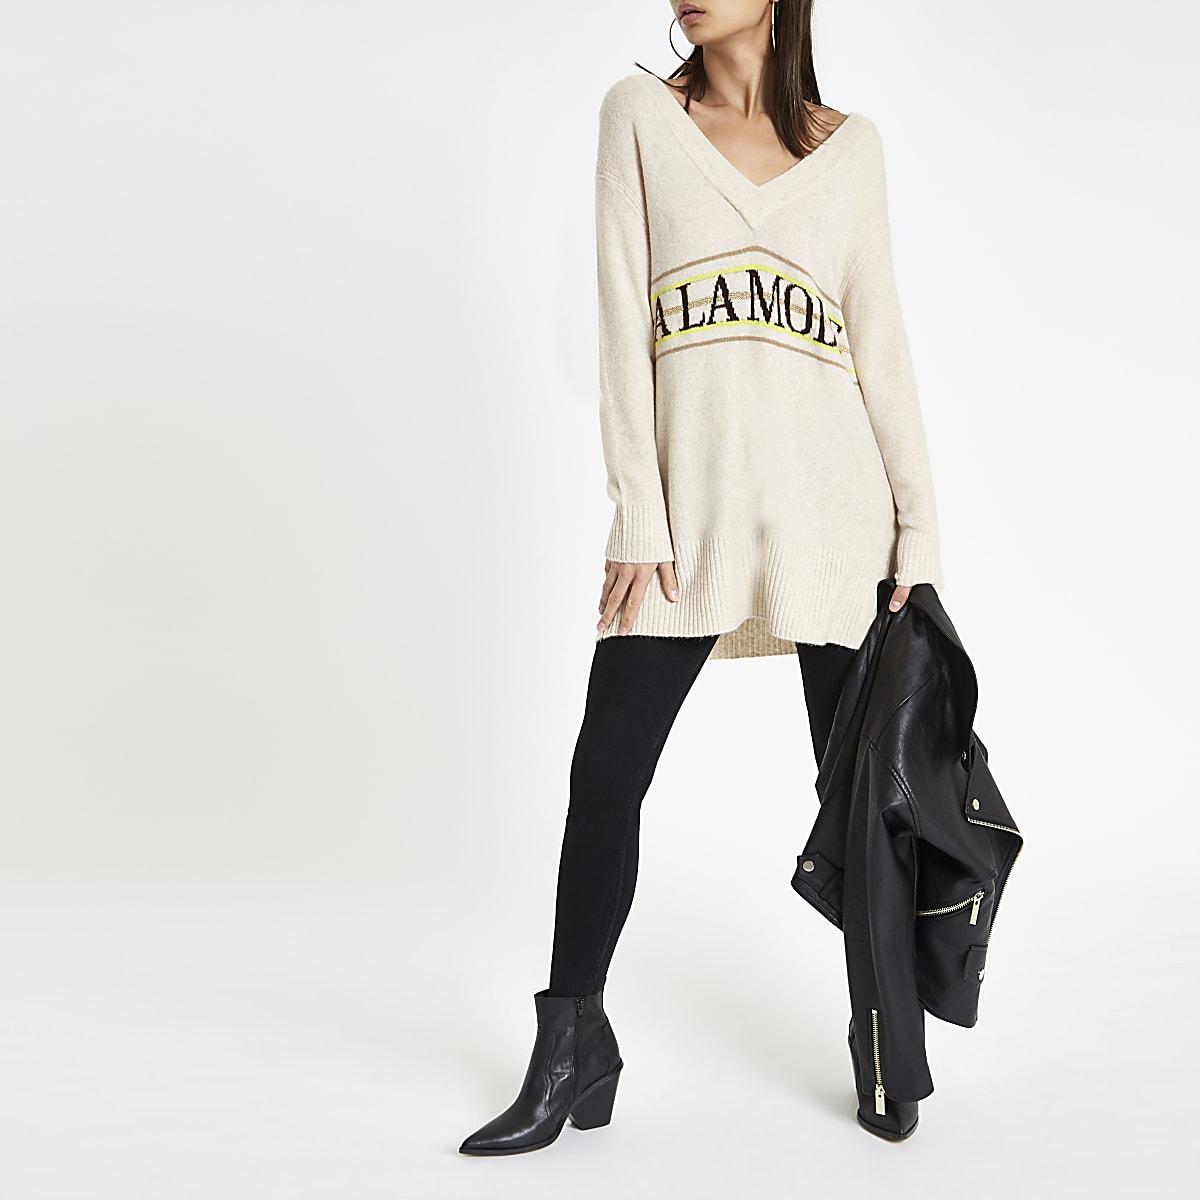 Beige 'A la mode' v neck sweater